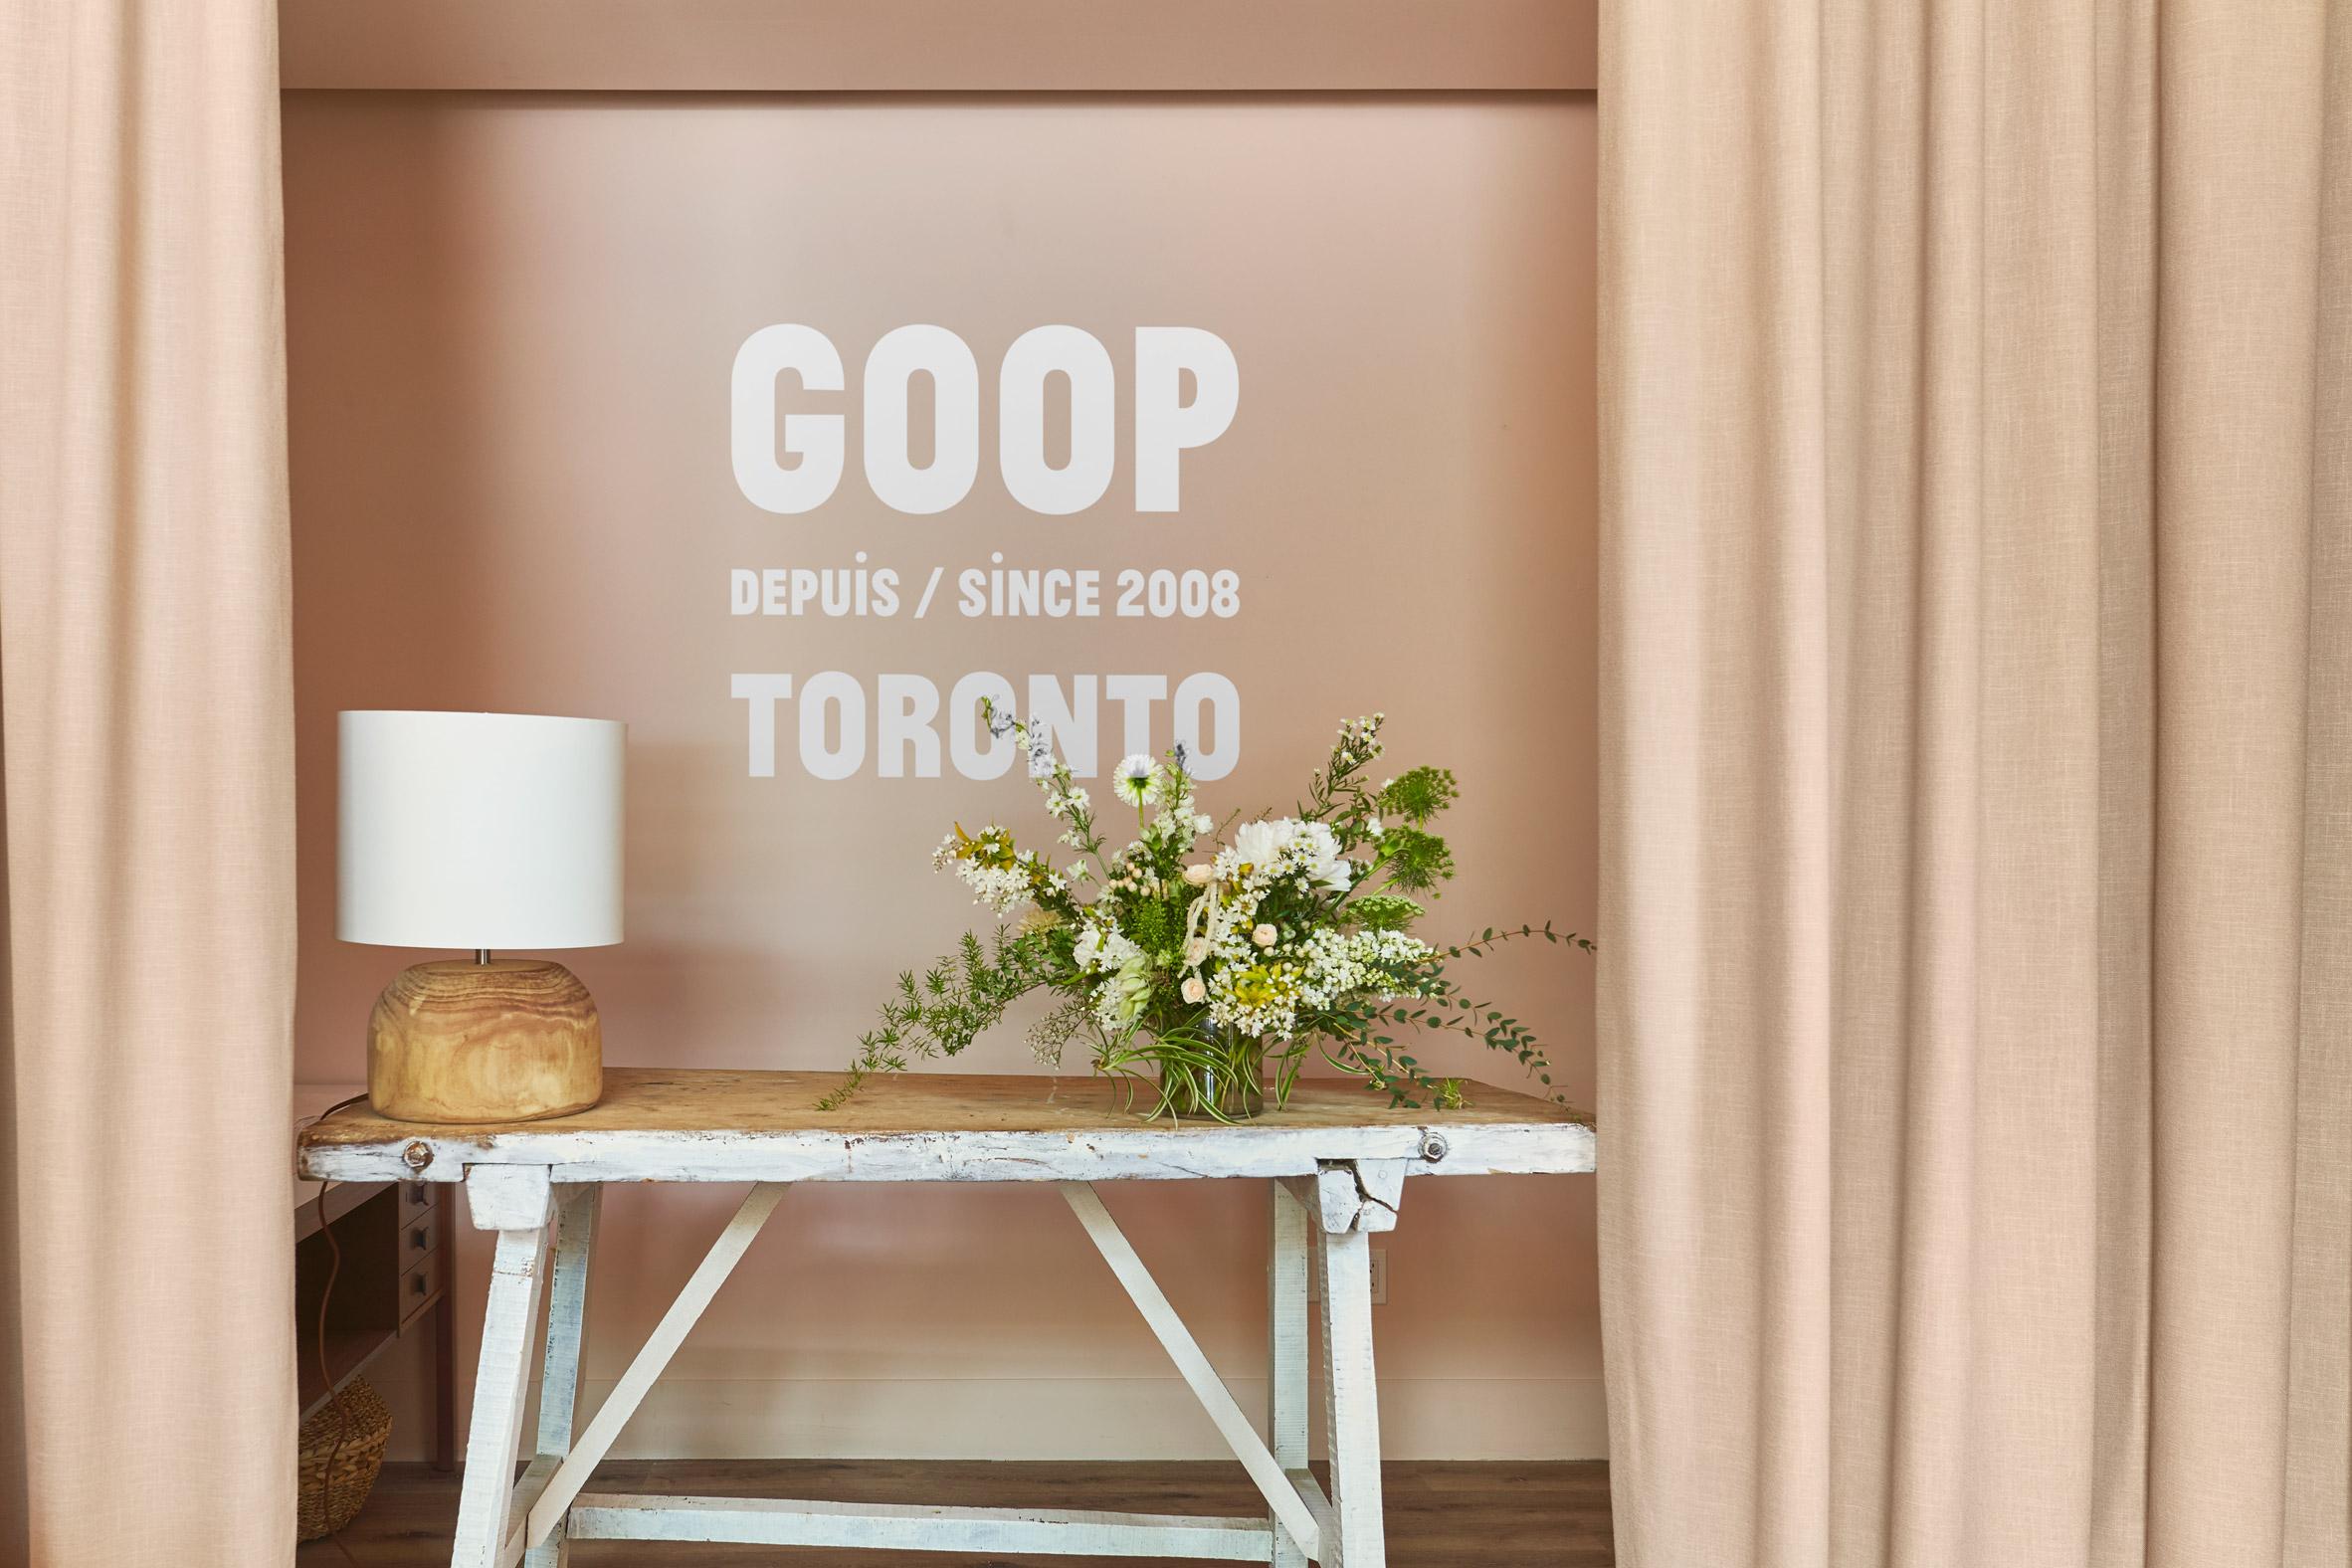 Goop pop-up in Toronto by Yabu Pushelberg